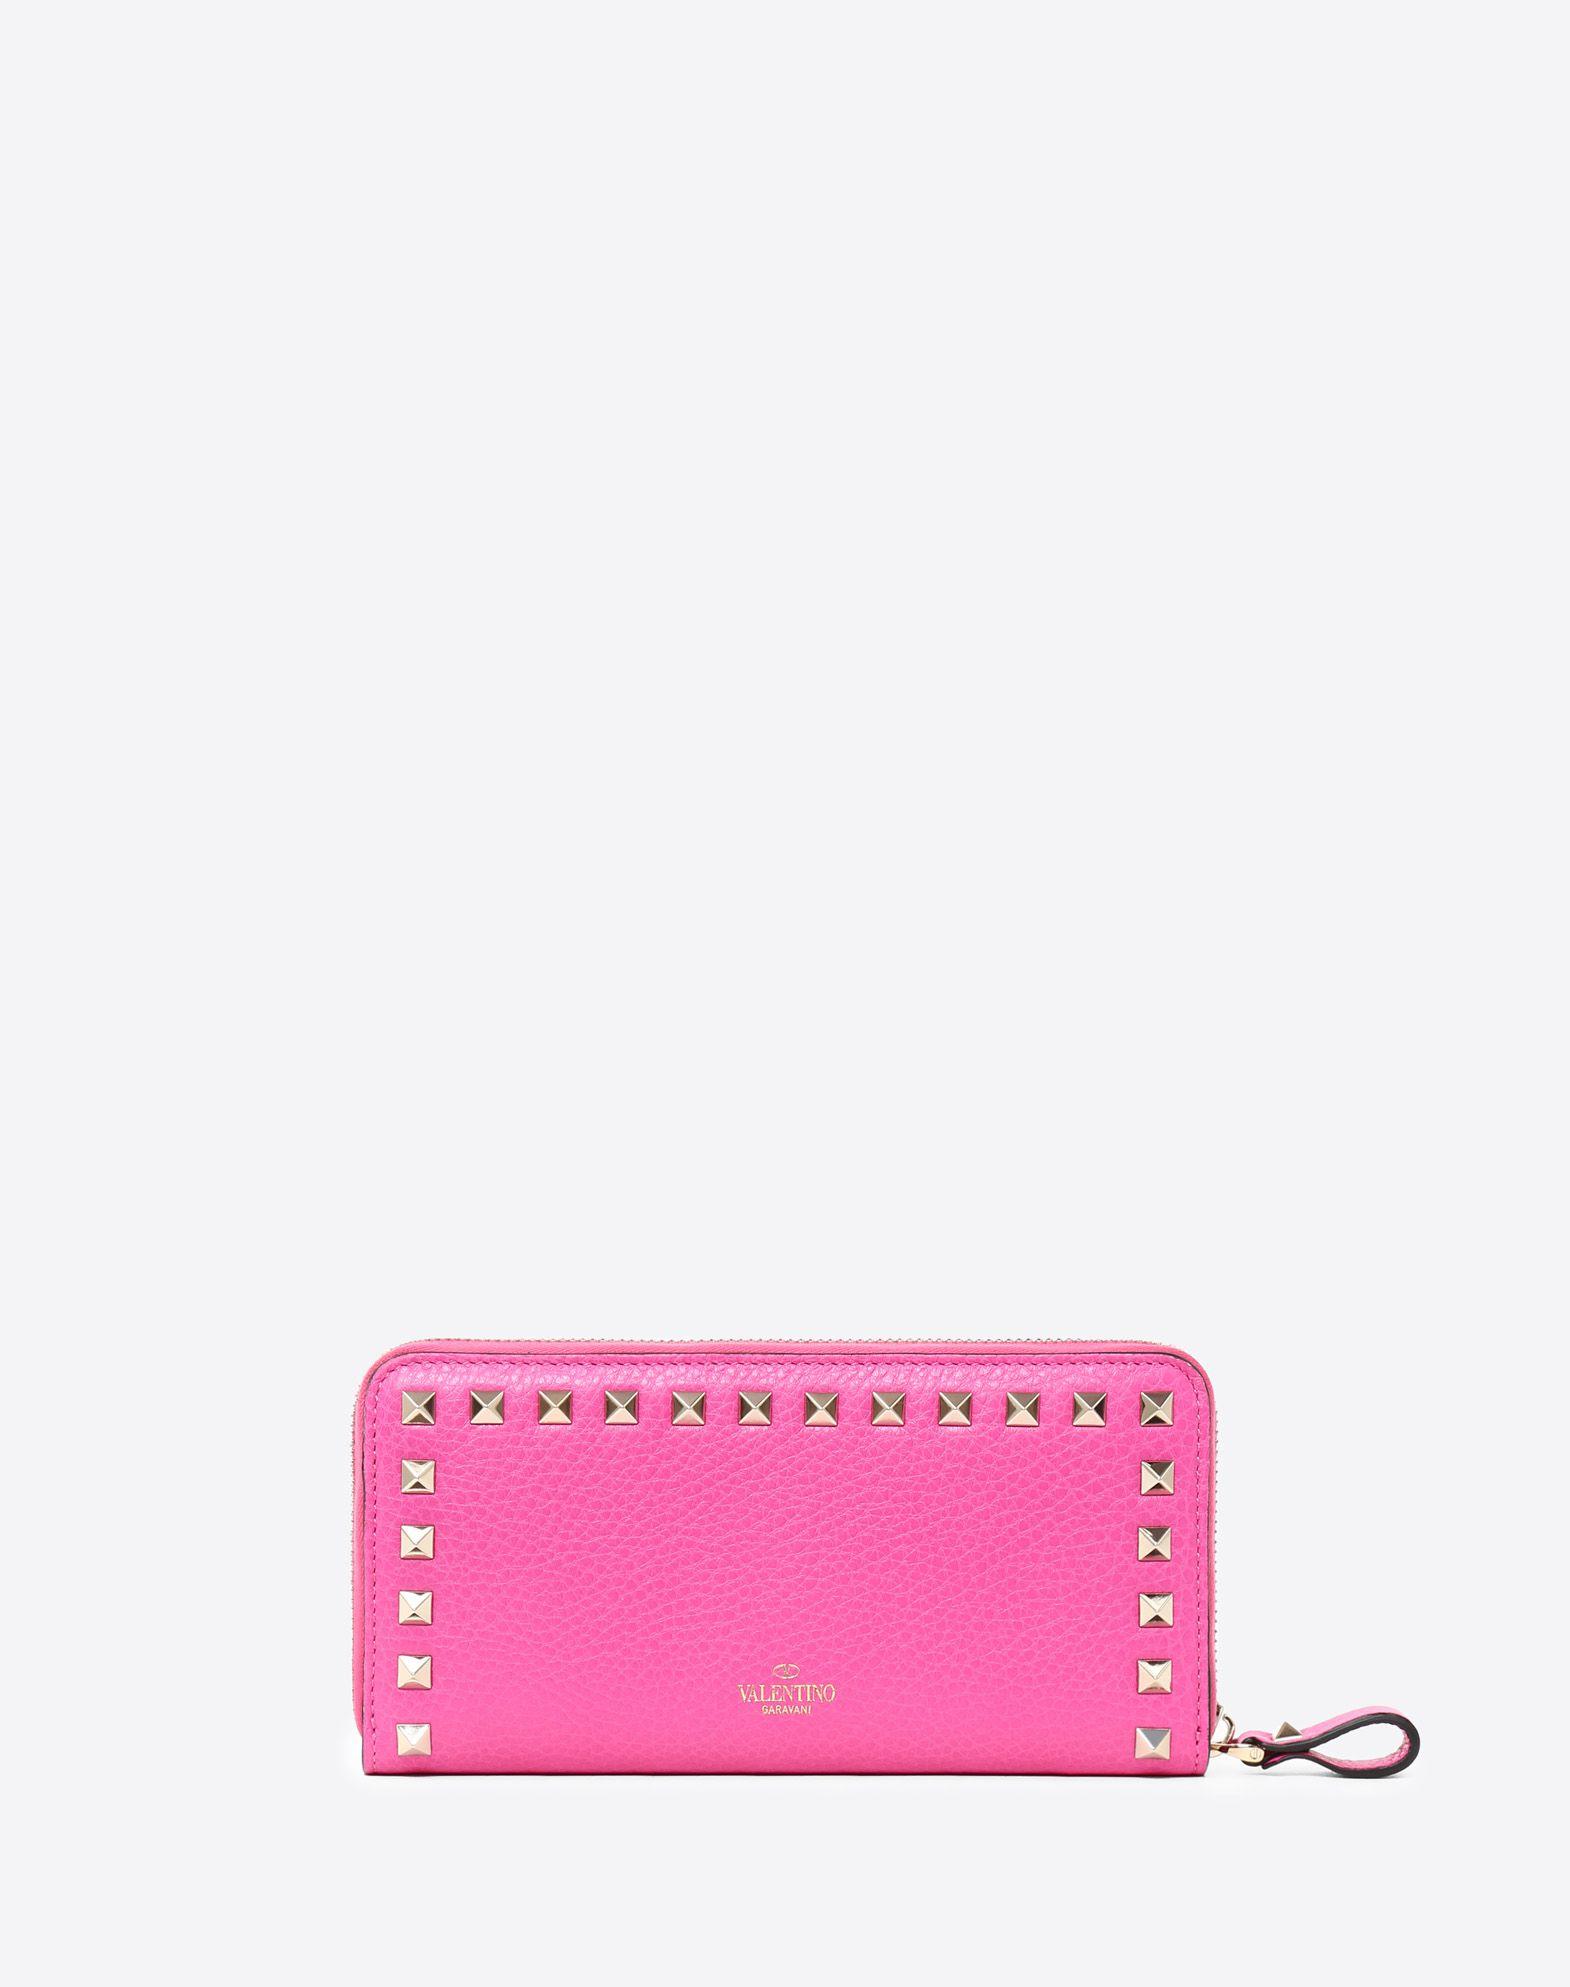 VALENTINO GARAVANI Rockstud Zipped Wallet ZIP AROUND WALLETS D d